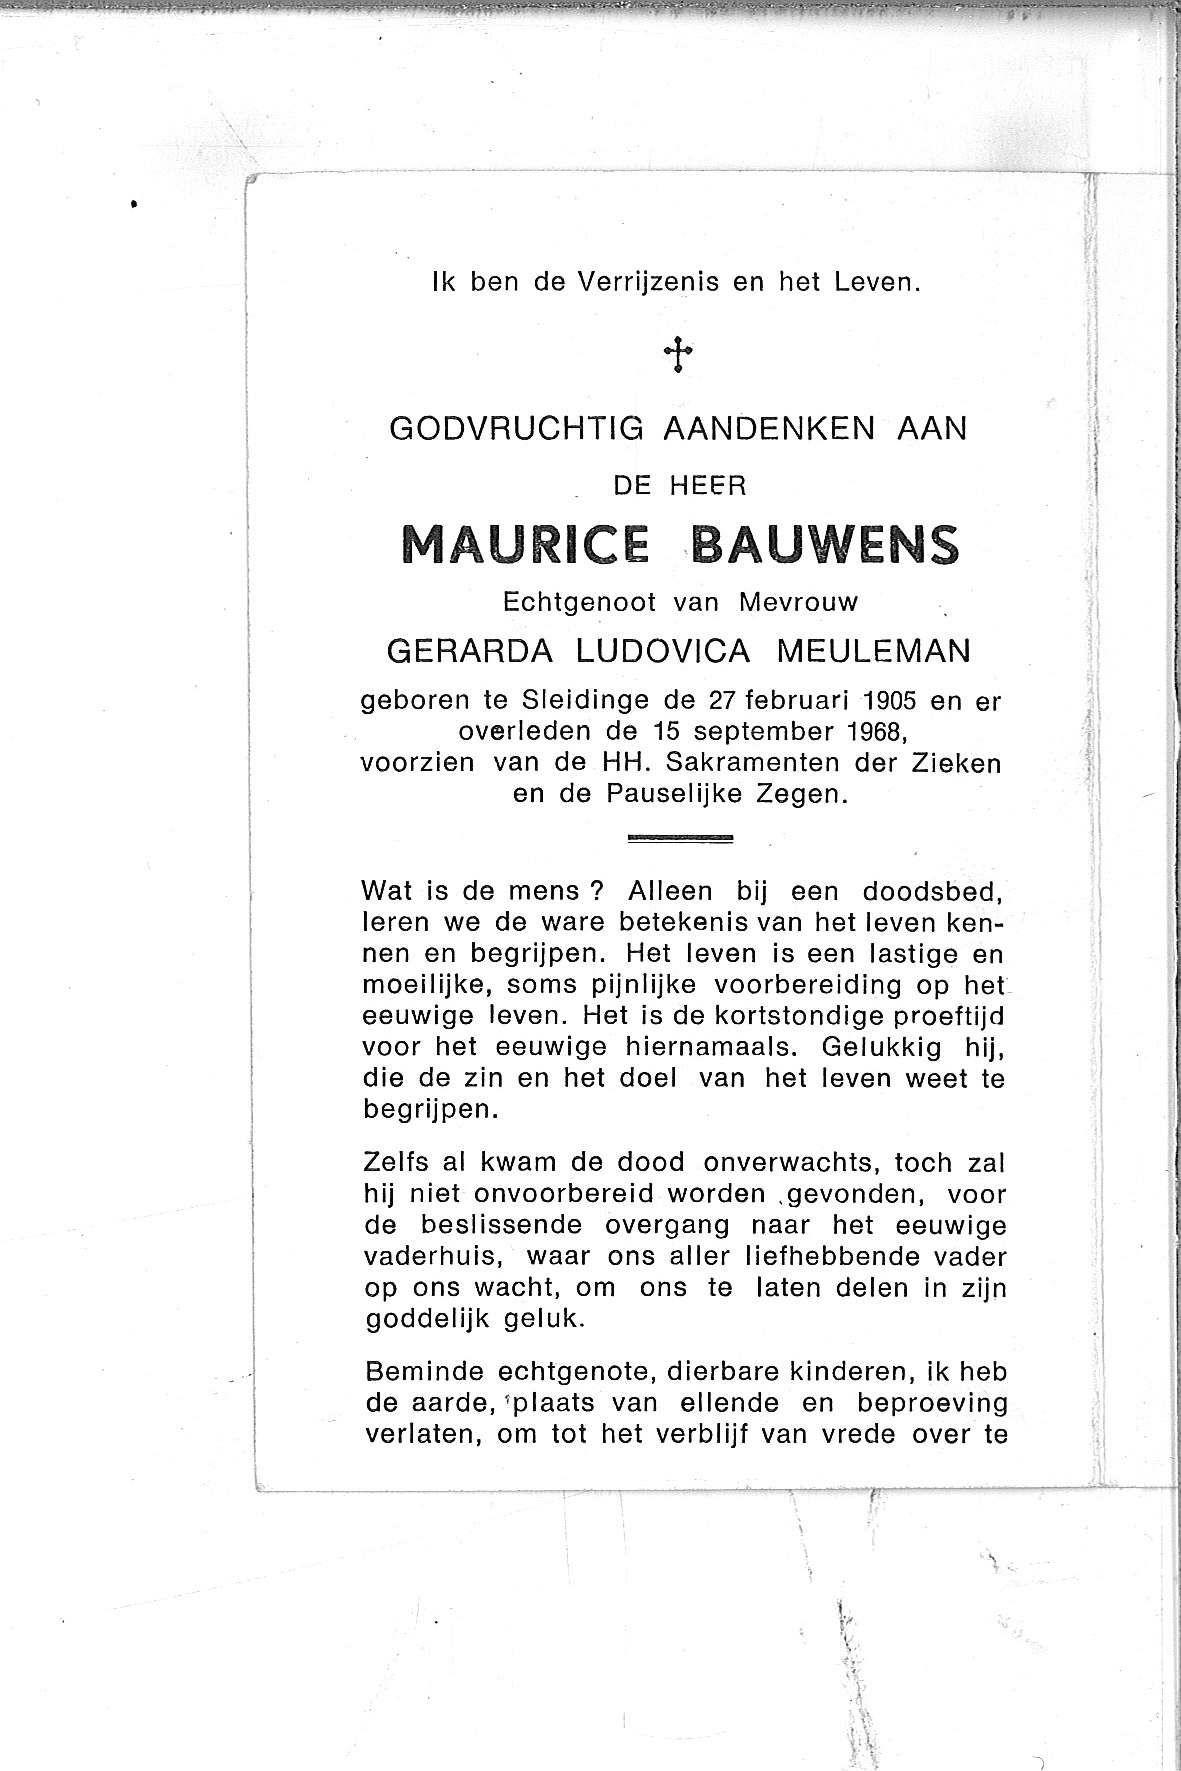 Maurice(1968)20130828133432_00052.jpg